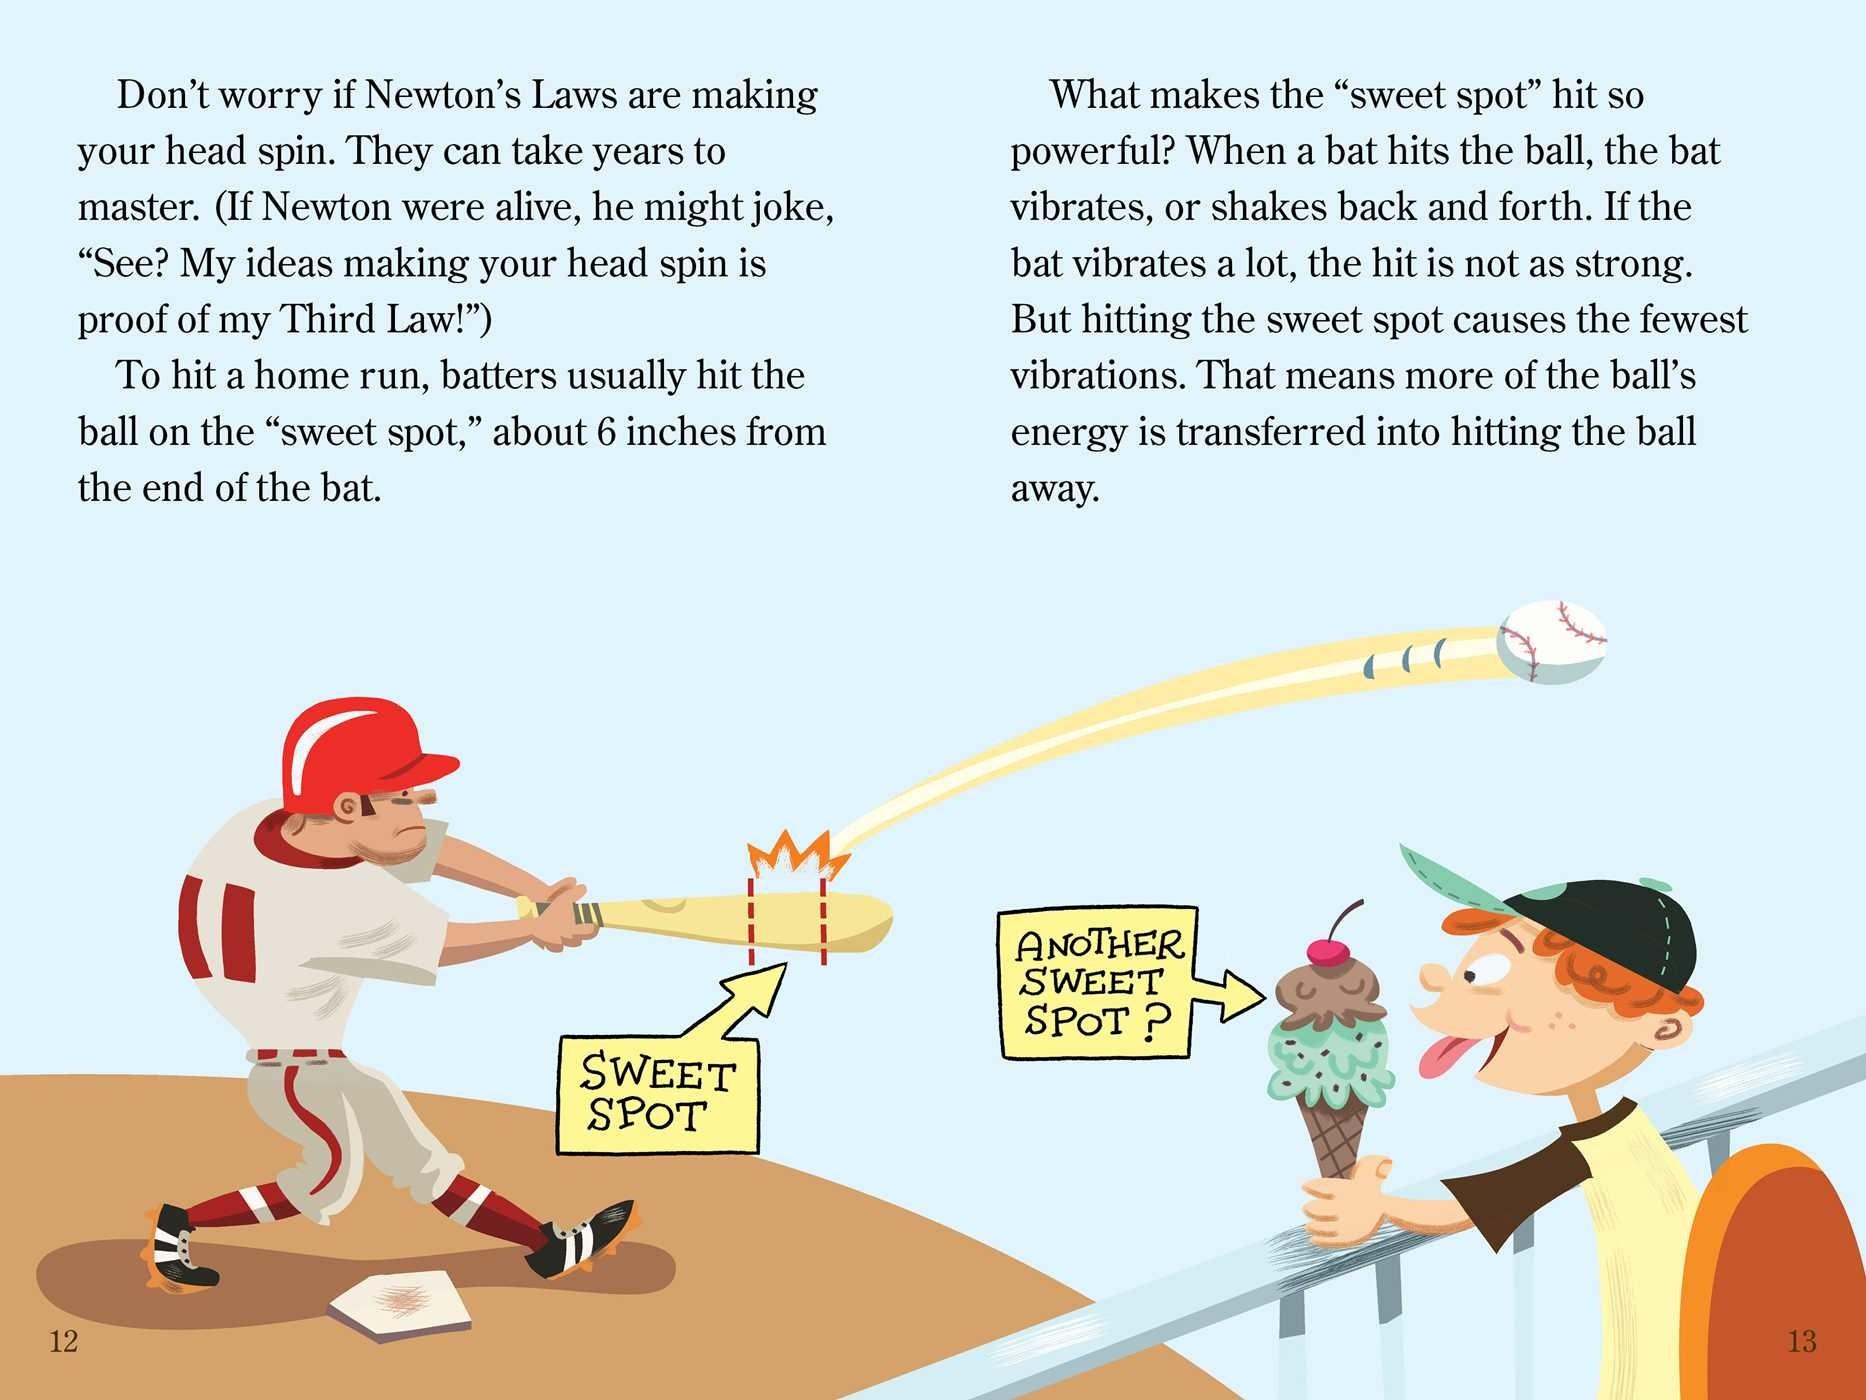 The Science behind Baseball